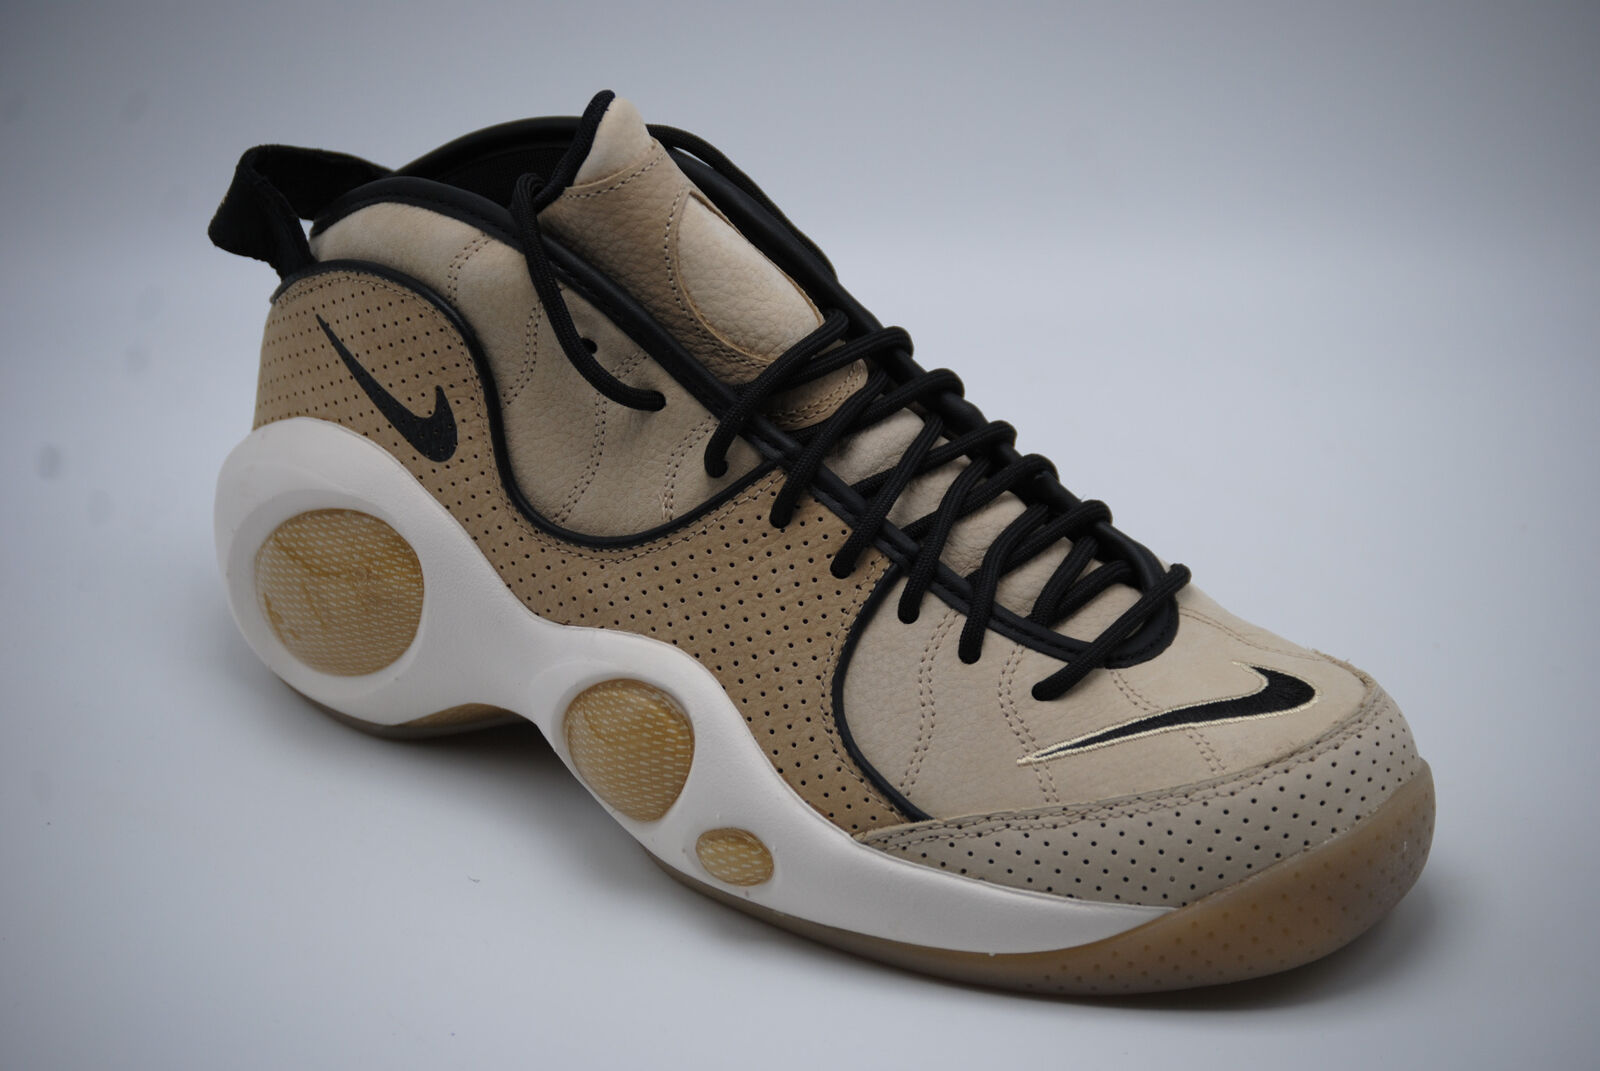 9c2e5d9c589b59 Nike Air Zoom Flight 95 Mens Size 9.5 Black Mushroom Sail 941943 001 ...